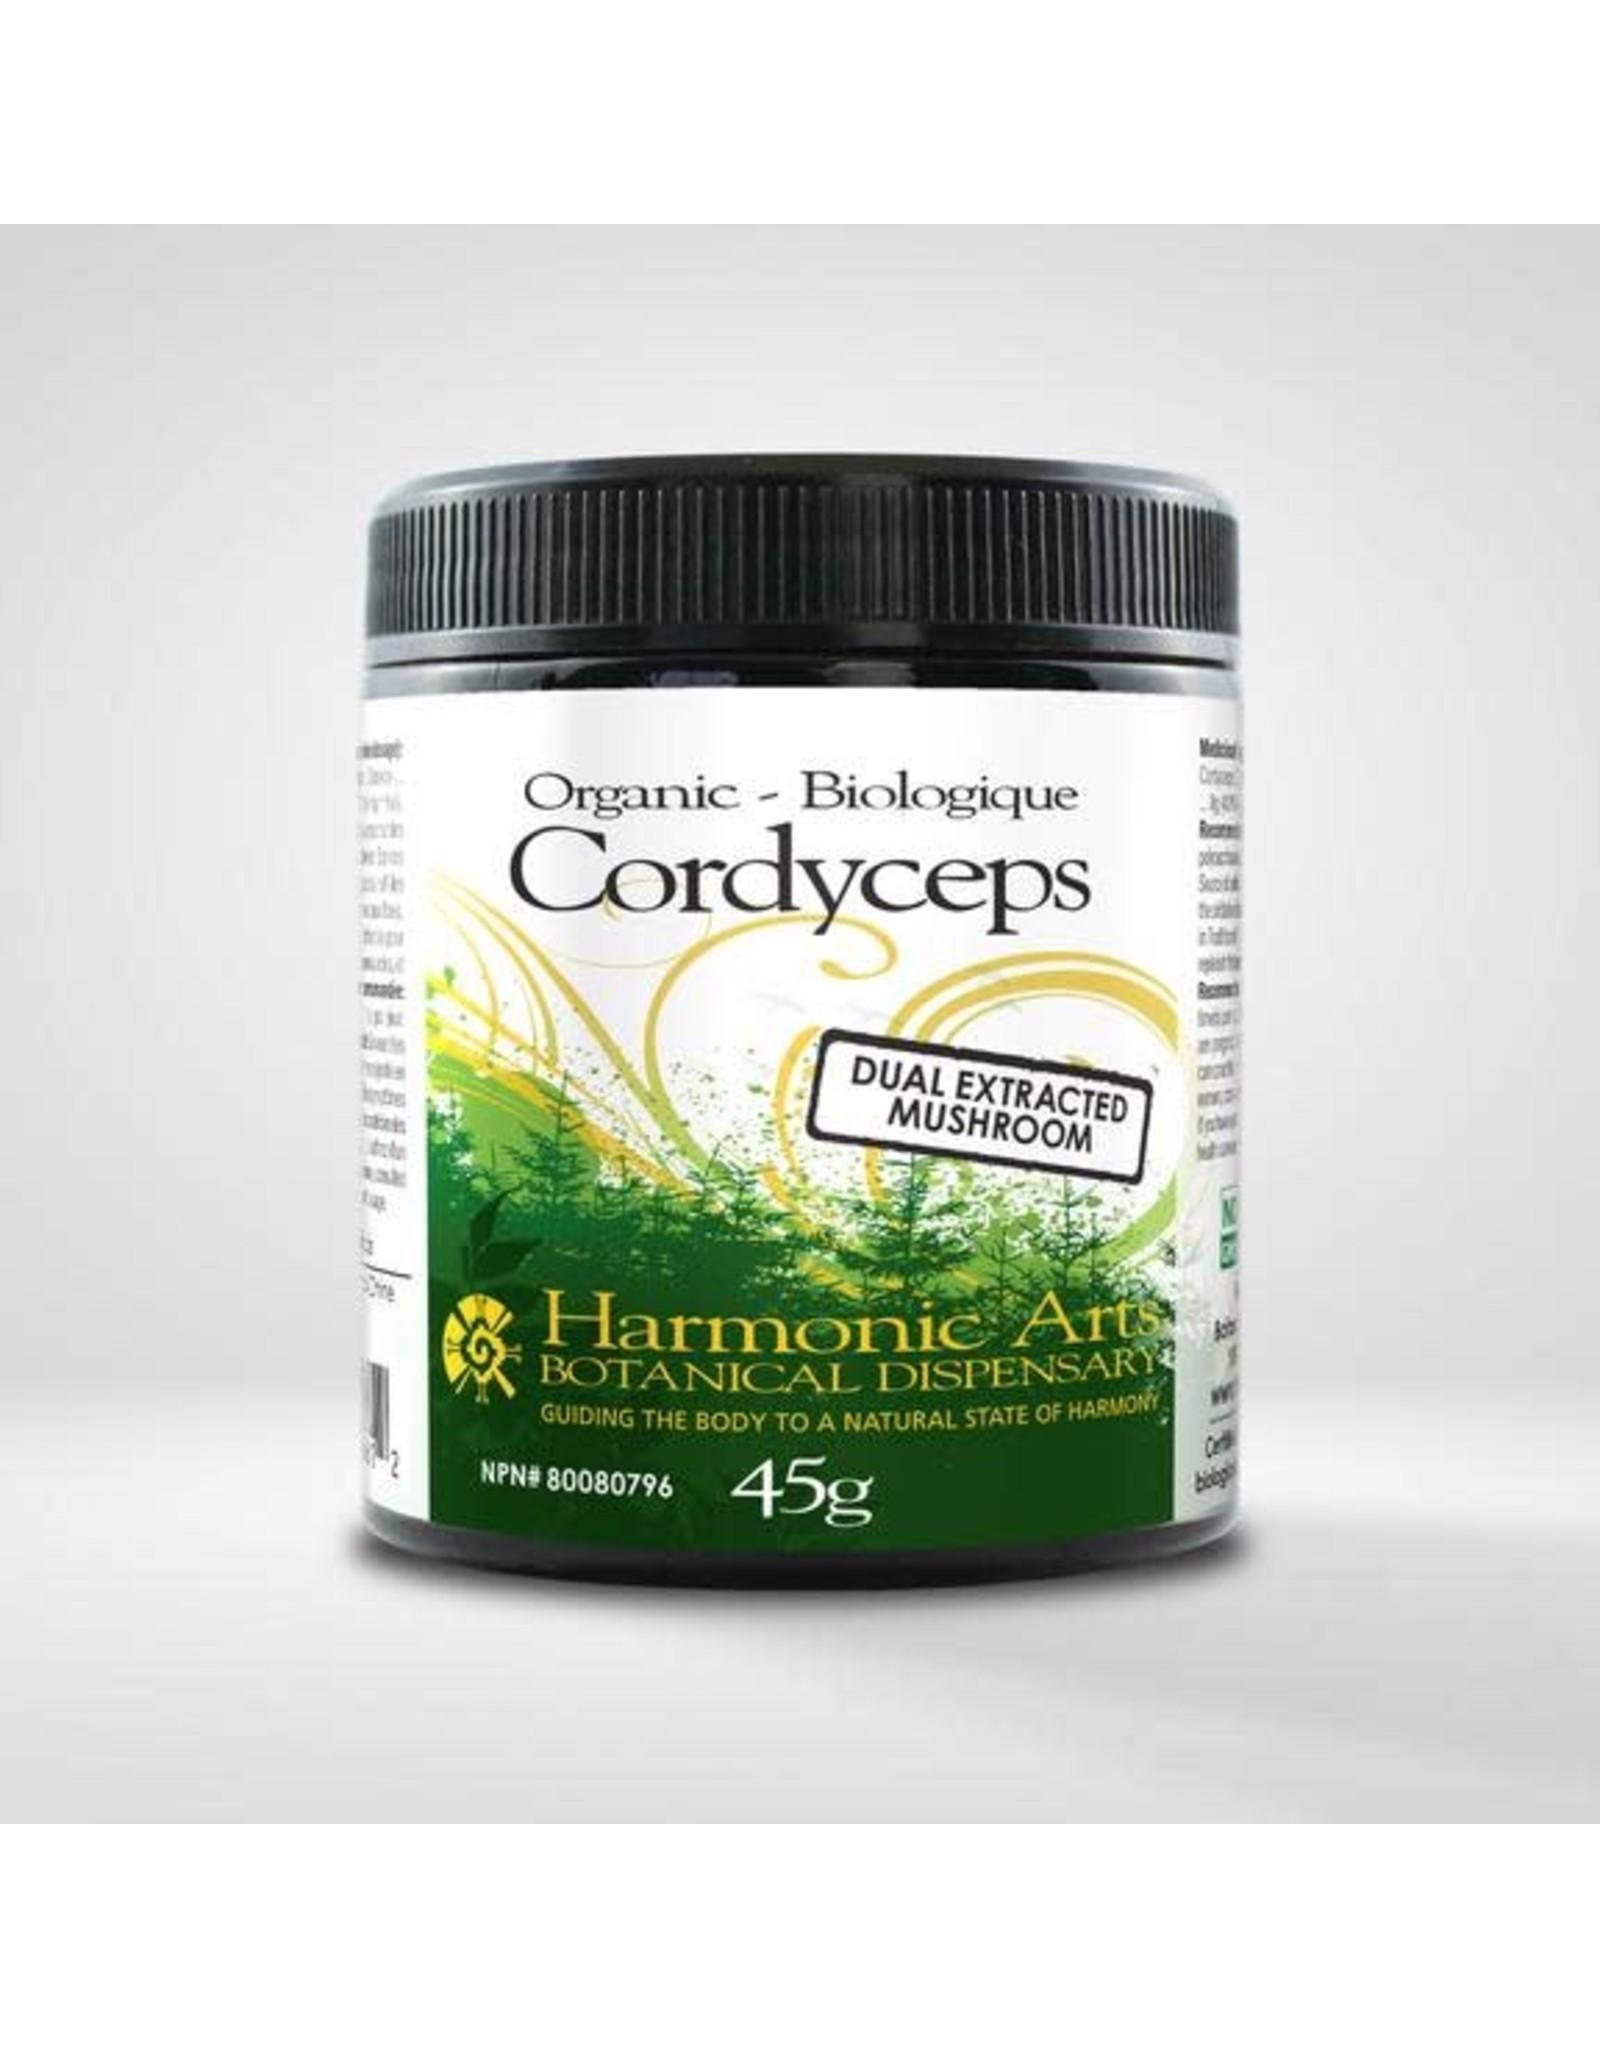 Harmonic Arts Cordyceps Dual Extract Powder